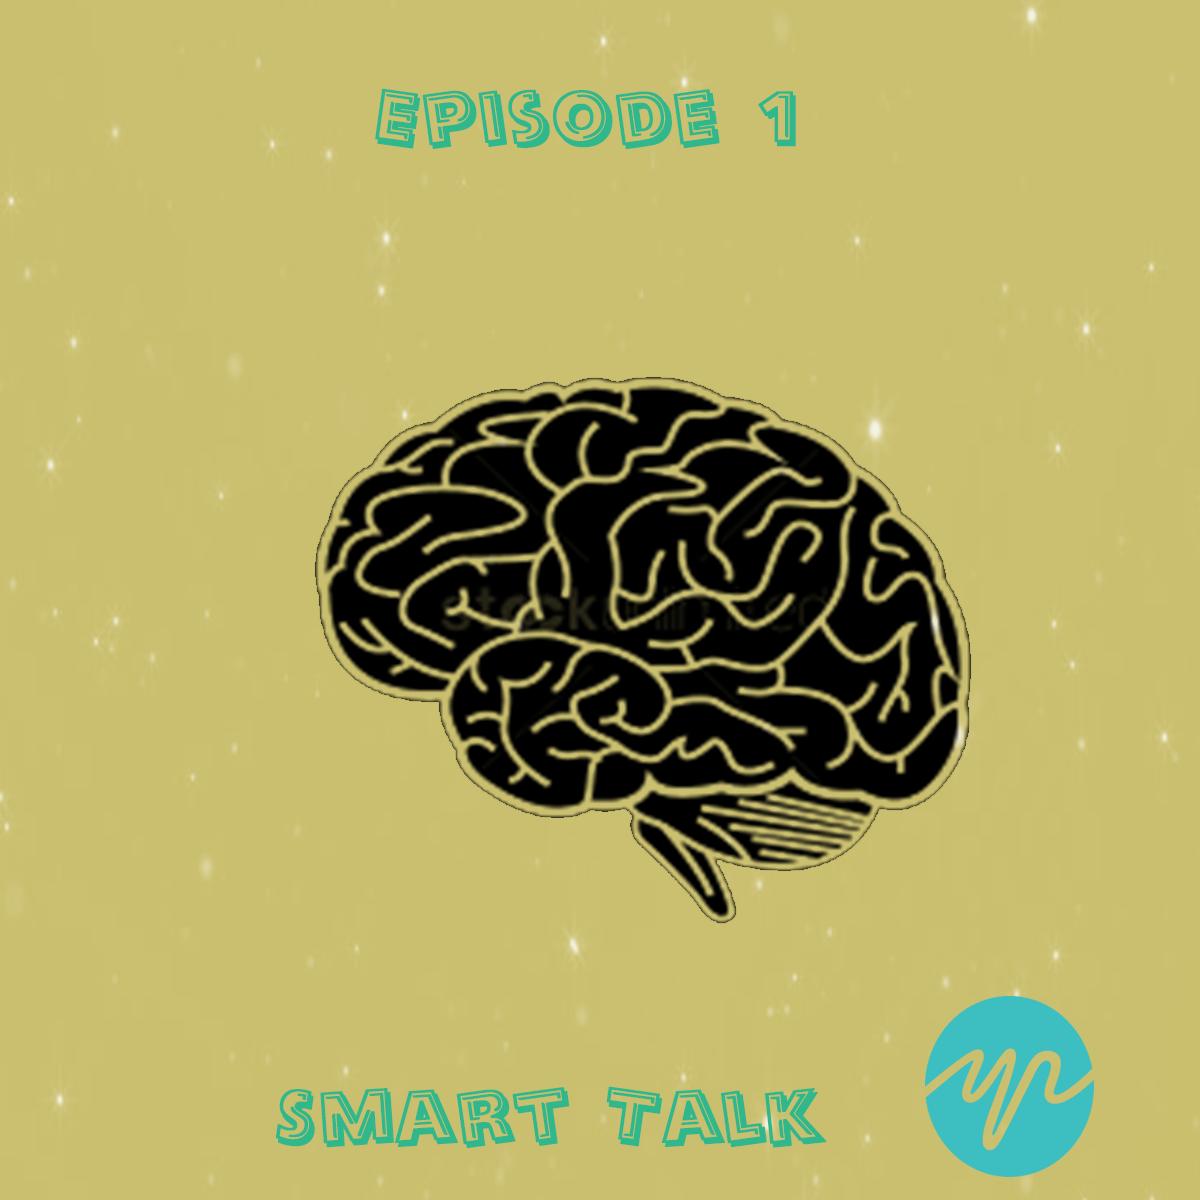 Youth Radio Raw: Smart Talk Episode 1